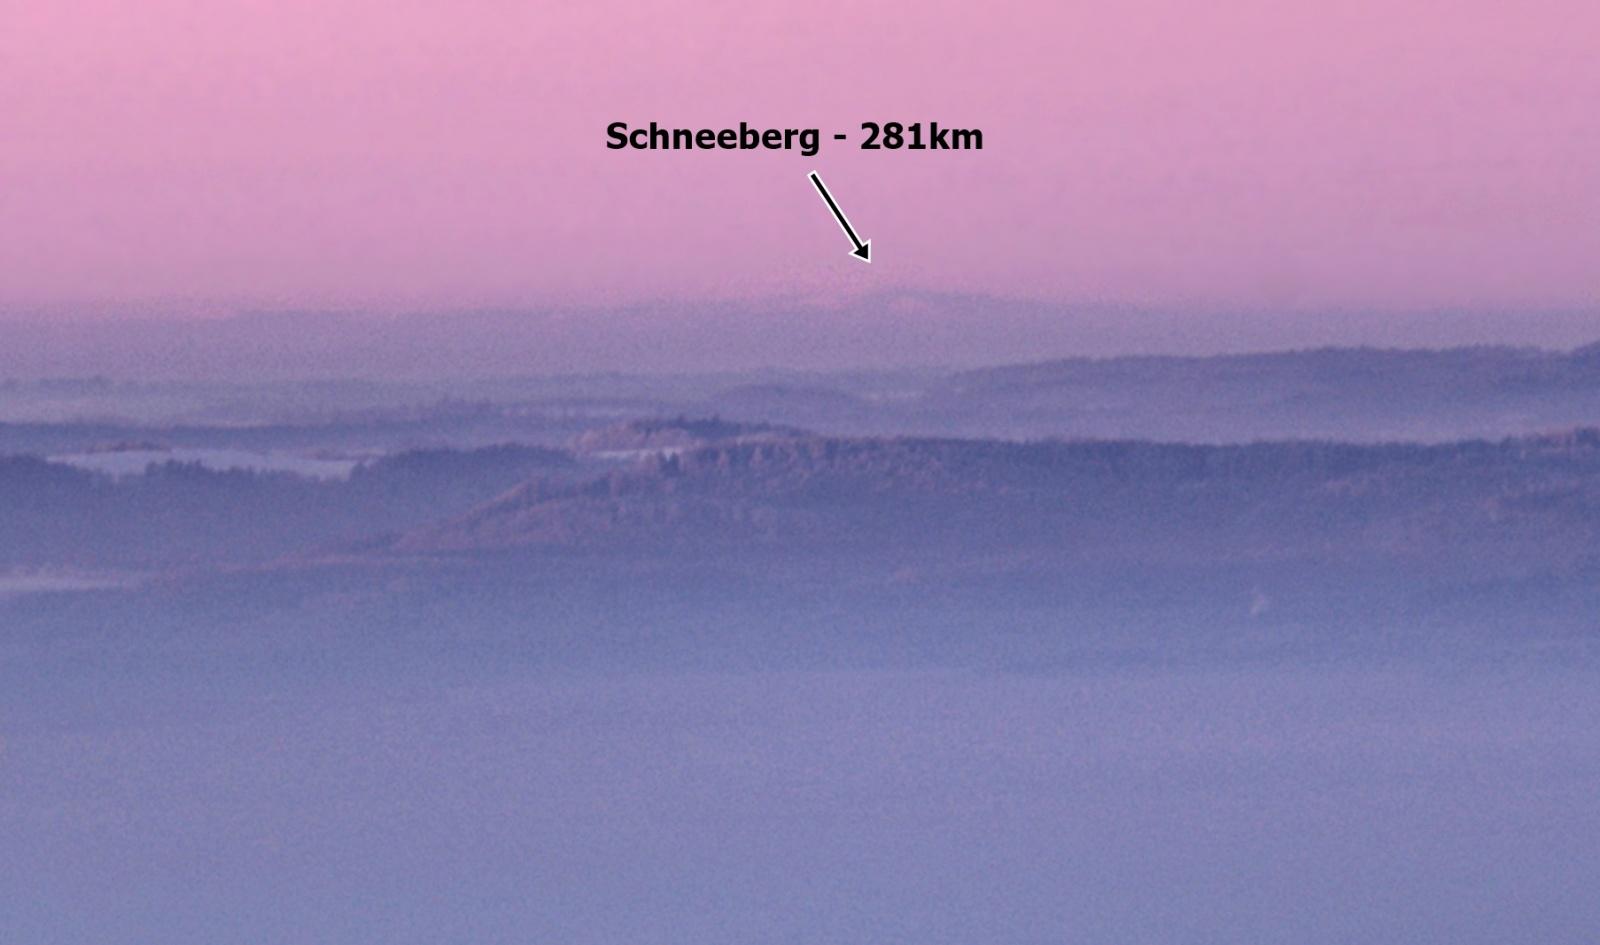 DSC_0533Schneeberg.thumb.jpg.5264445b9c3fca94804e943b4bd9c52b.jpg